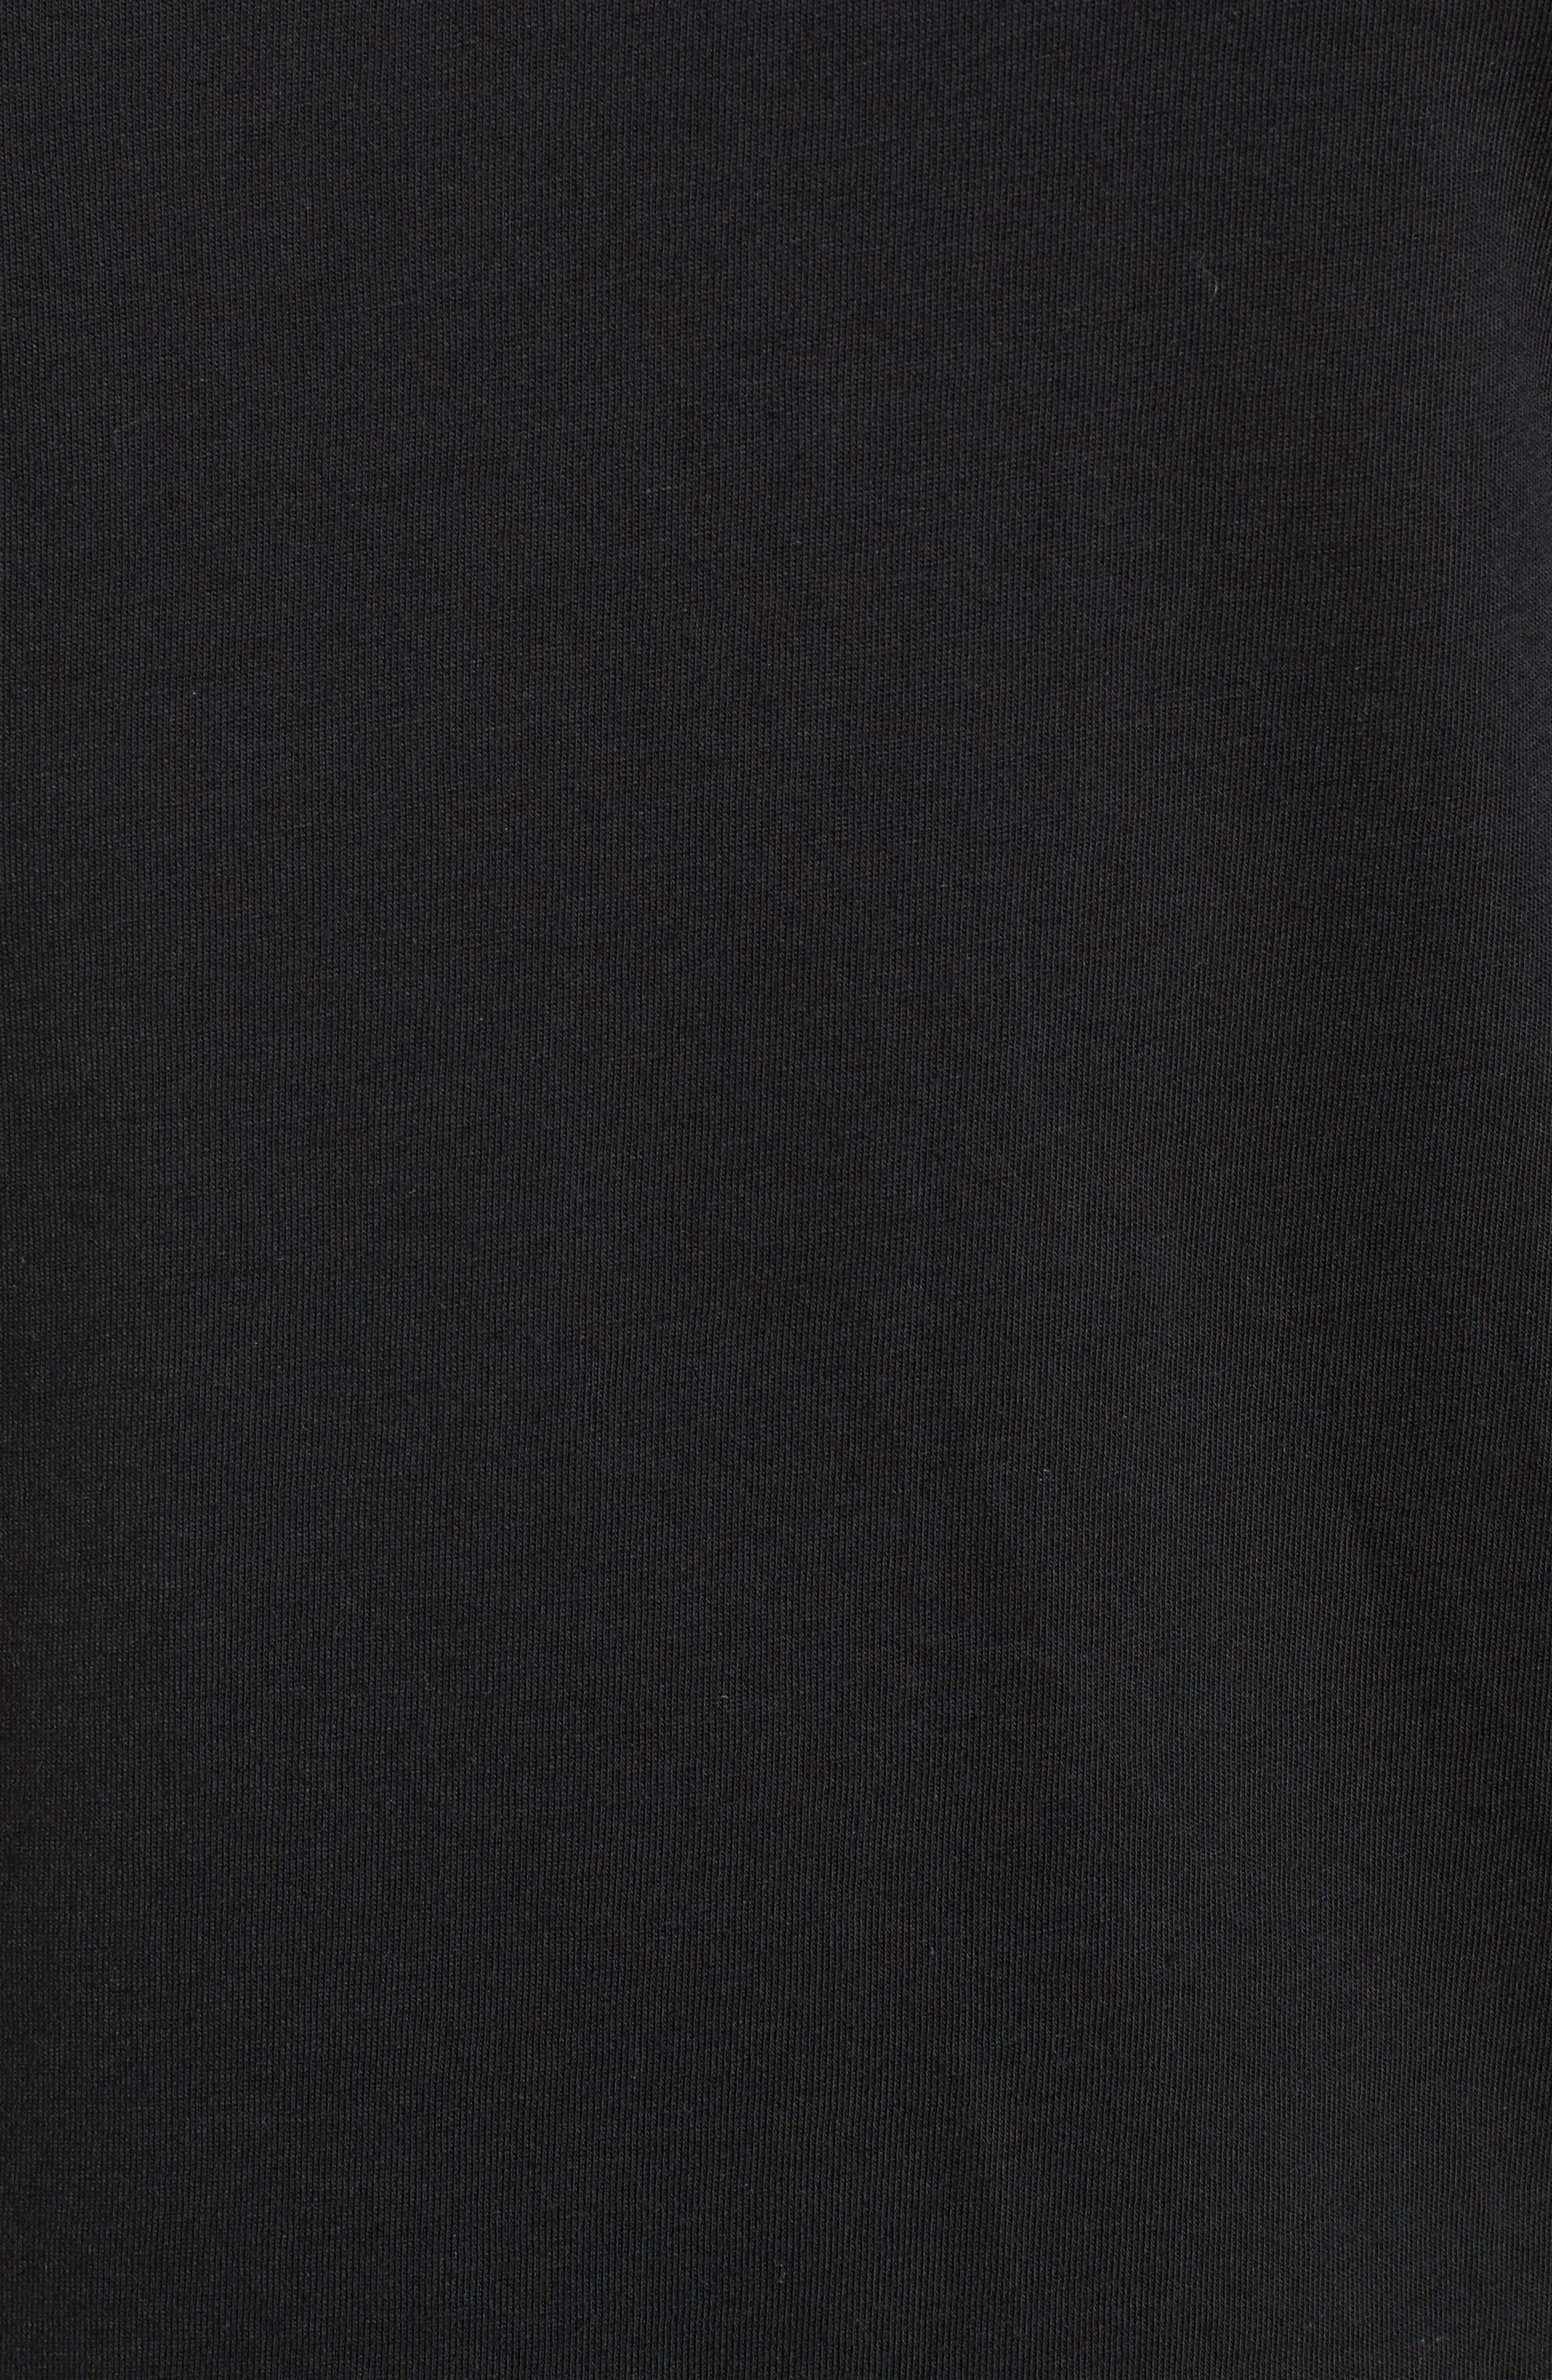 Nike Dry 23 Alpha Hooded Shirt,                             Alternate thumbnail 5, color,                             010